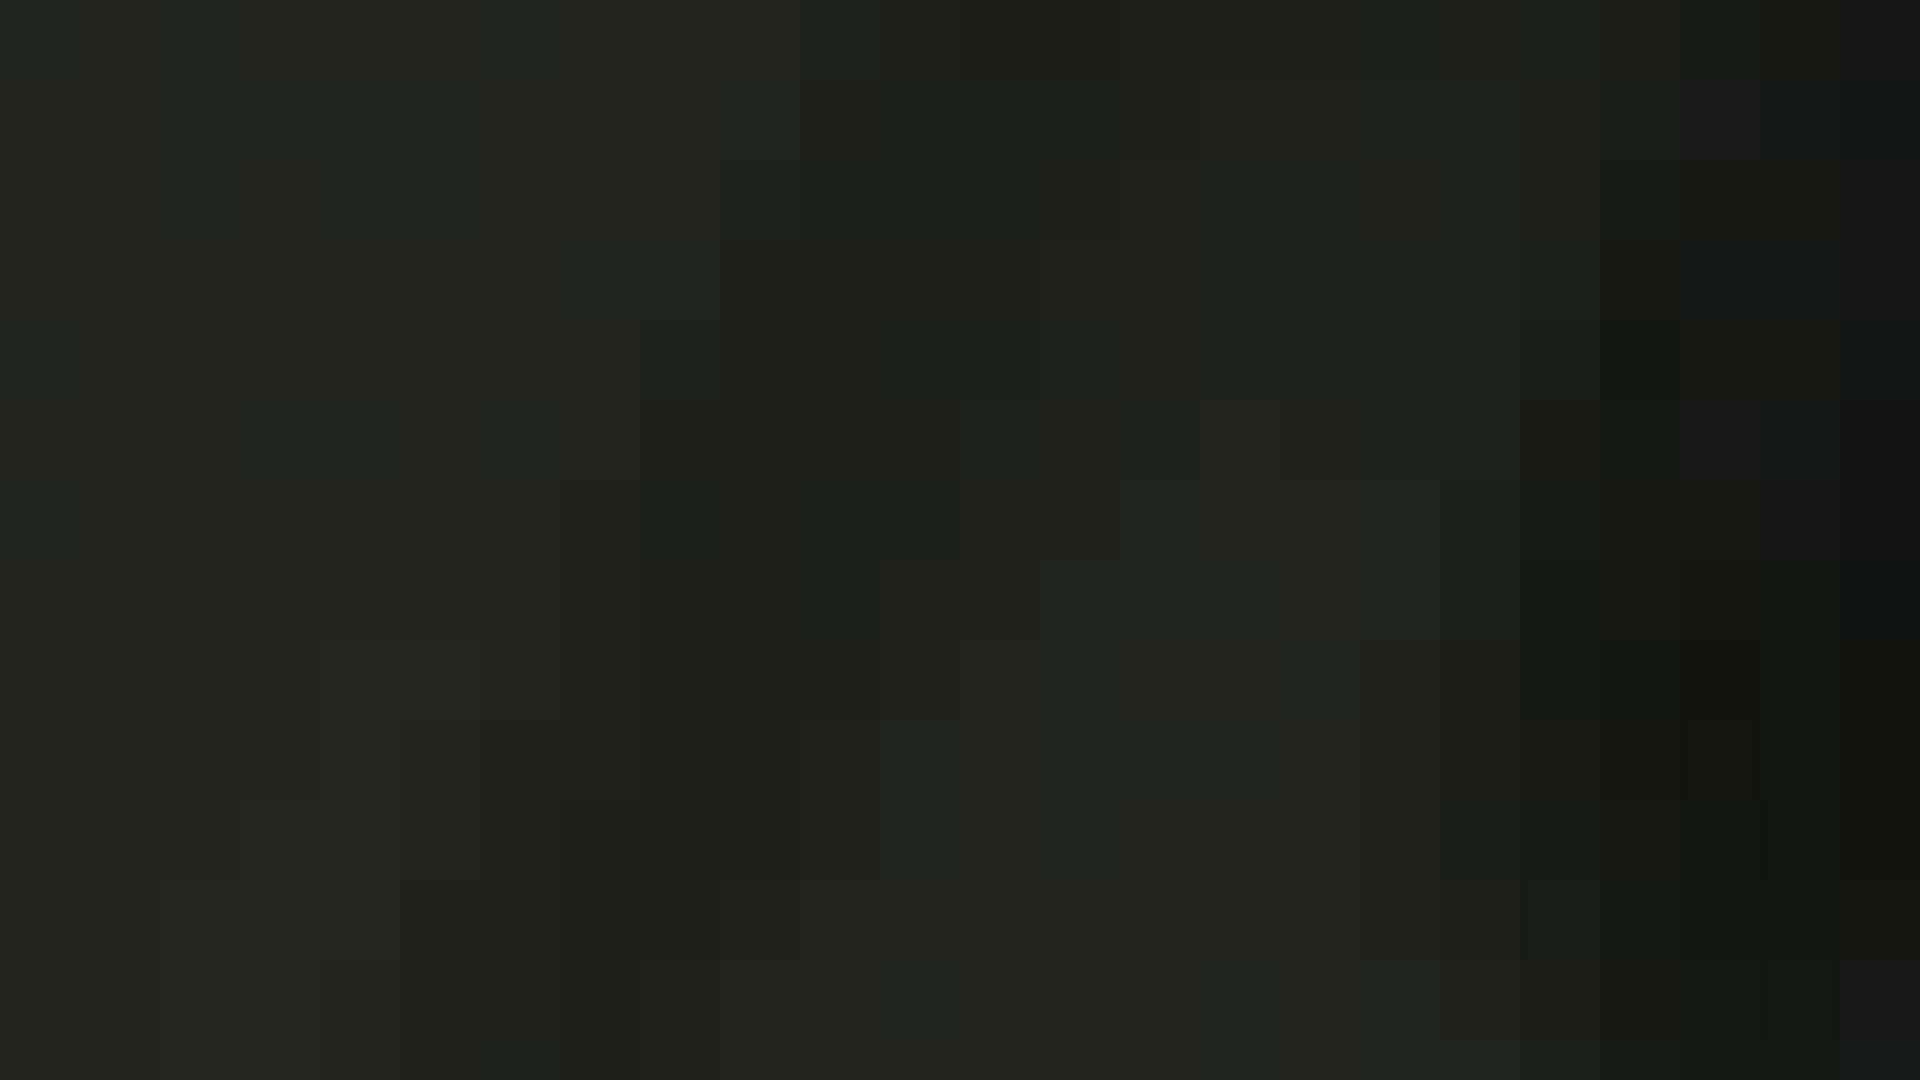 vol.02 着替えシーンもありマス OLの実態 覗きオメコ動画キャプチャ 52pic 38